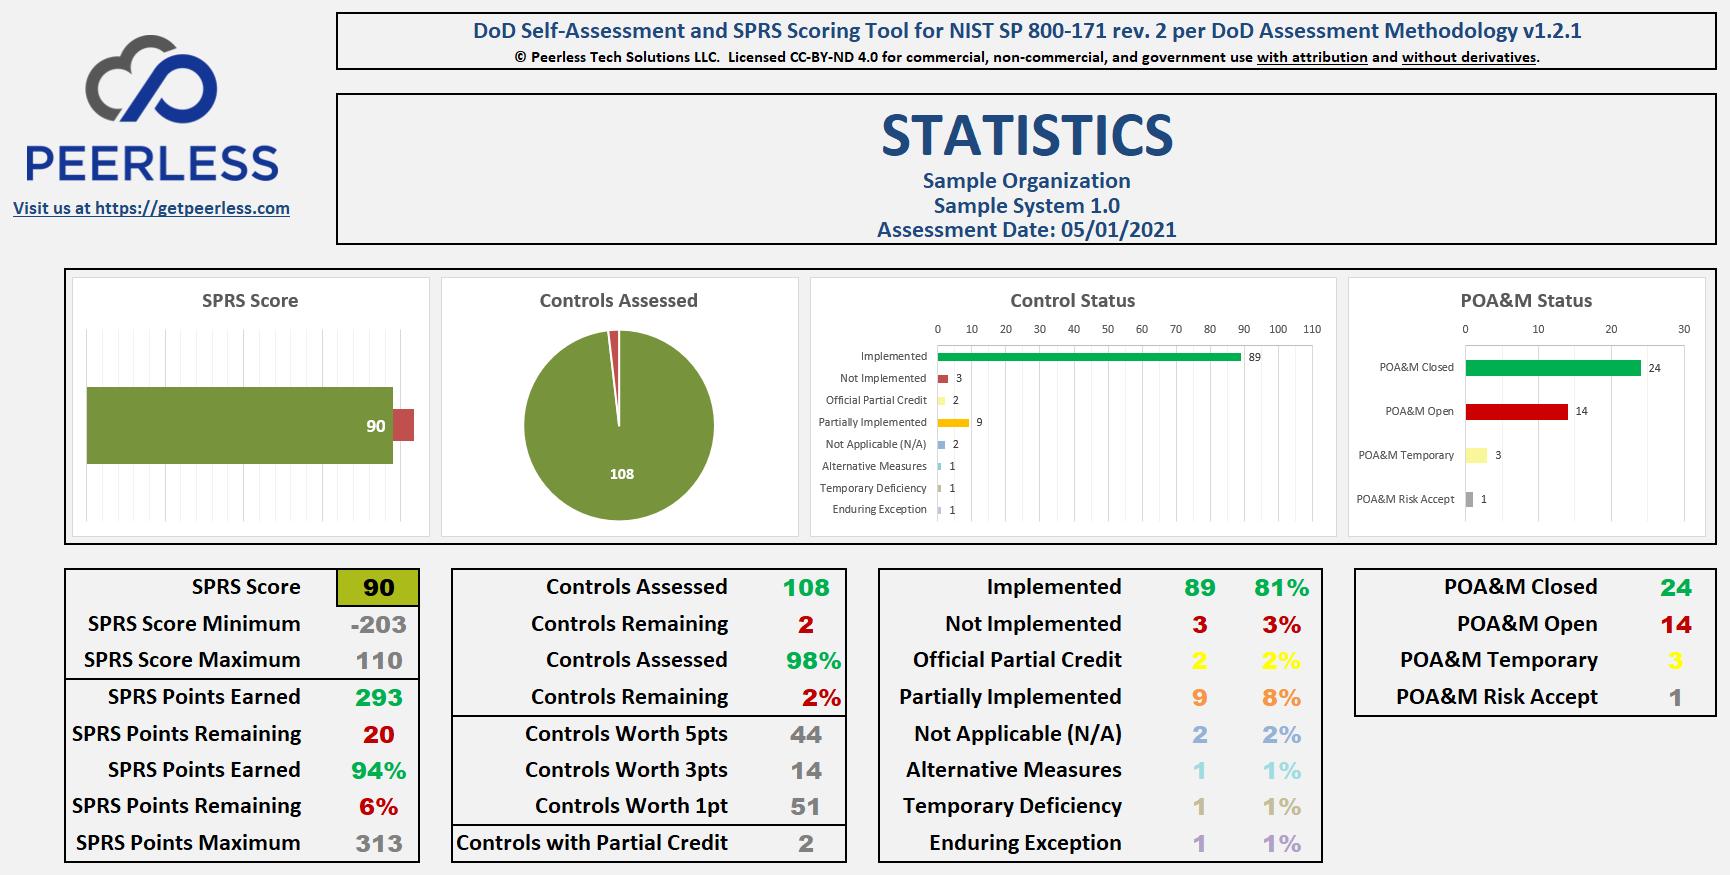 Peerless - DoD Self-Assessment and SPRS Score v1.2.1d_SAMPLE_20210922-1